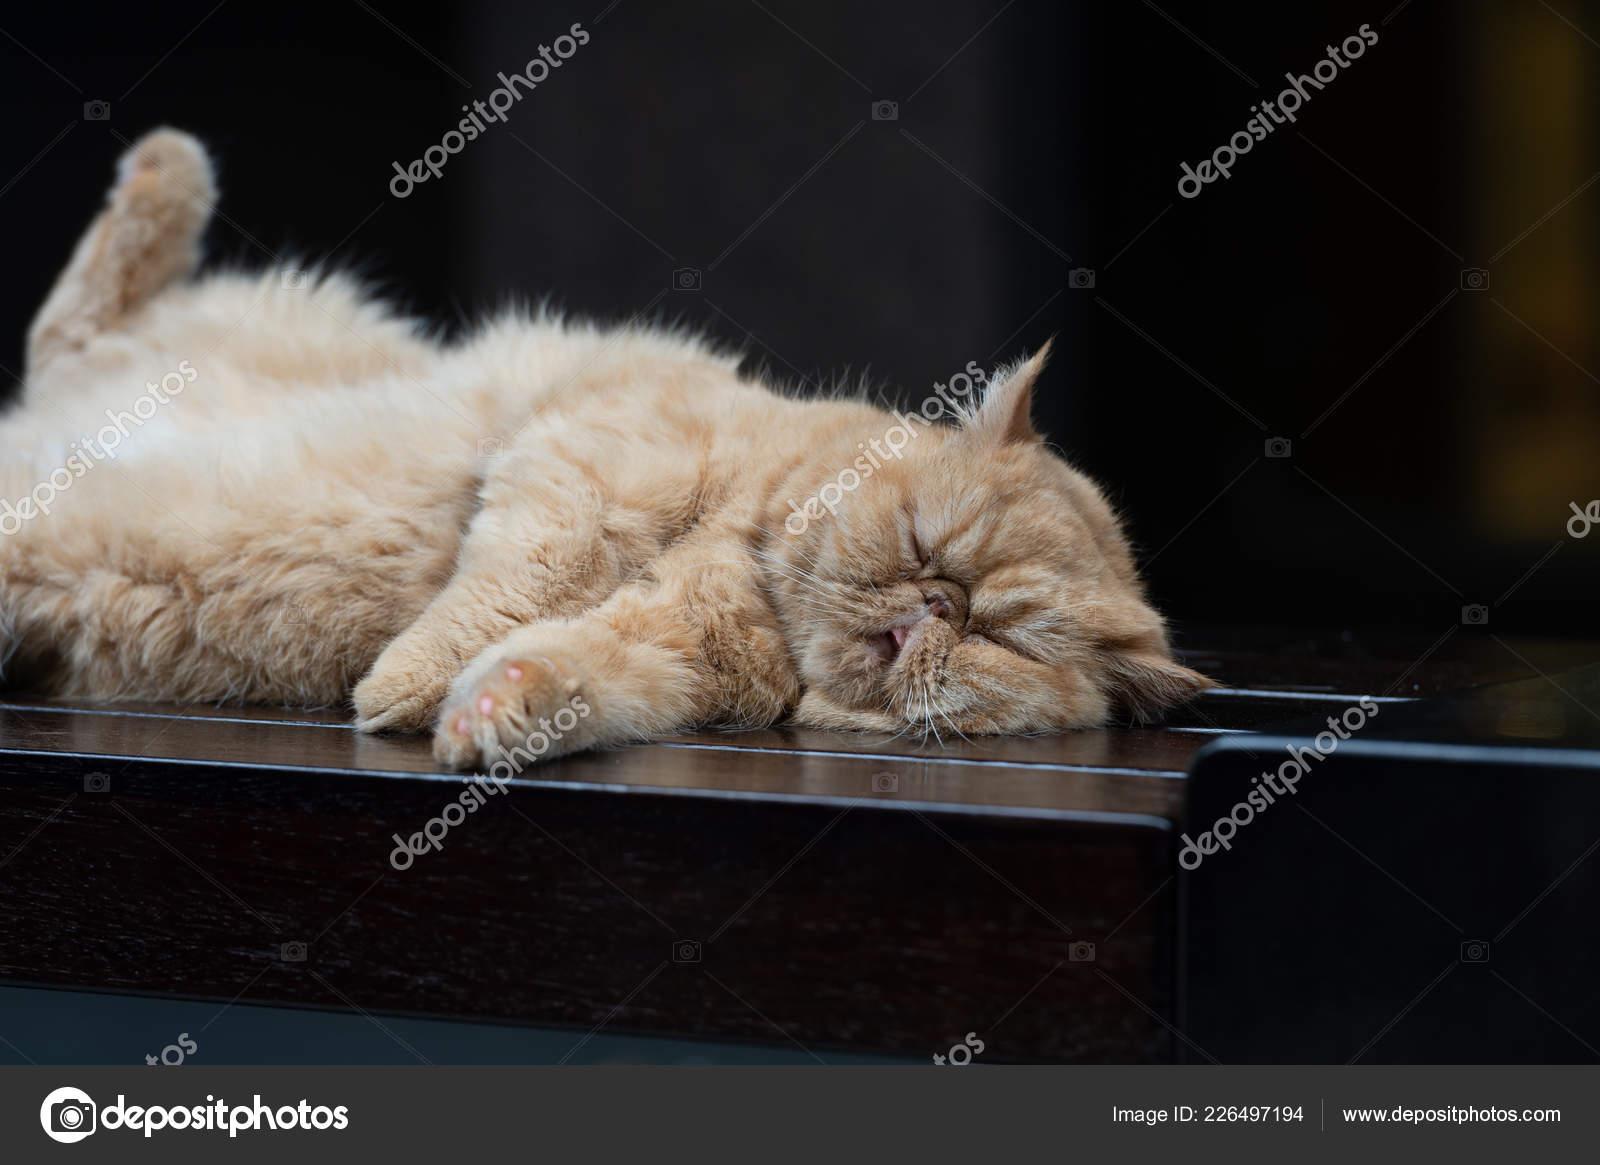 Kitten Resting Bizarre Posture Stock Photo C Robbin0919 Gmail Com 226497194